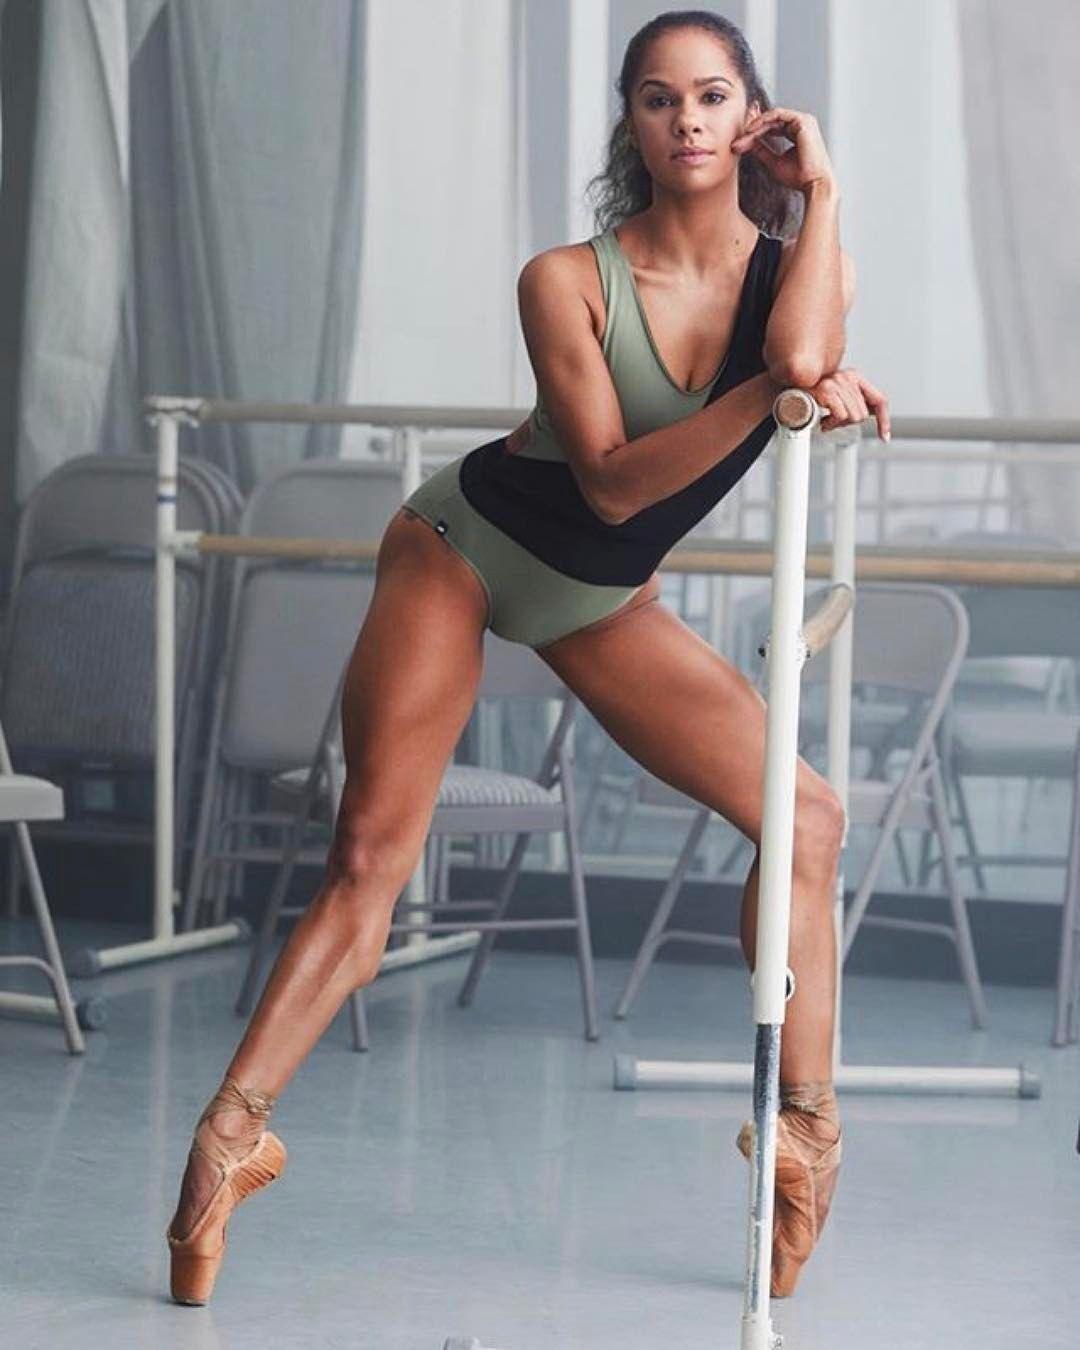 Misty Copeland nudes (59 fotos) Hot, Twitter, legs